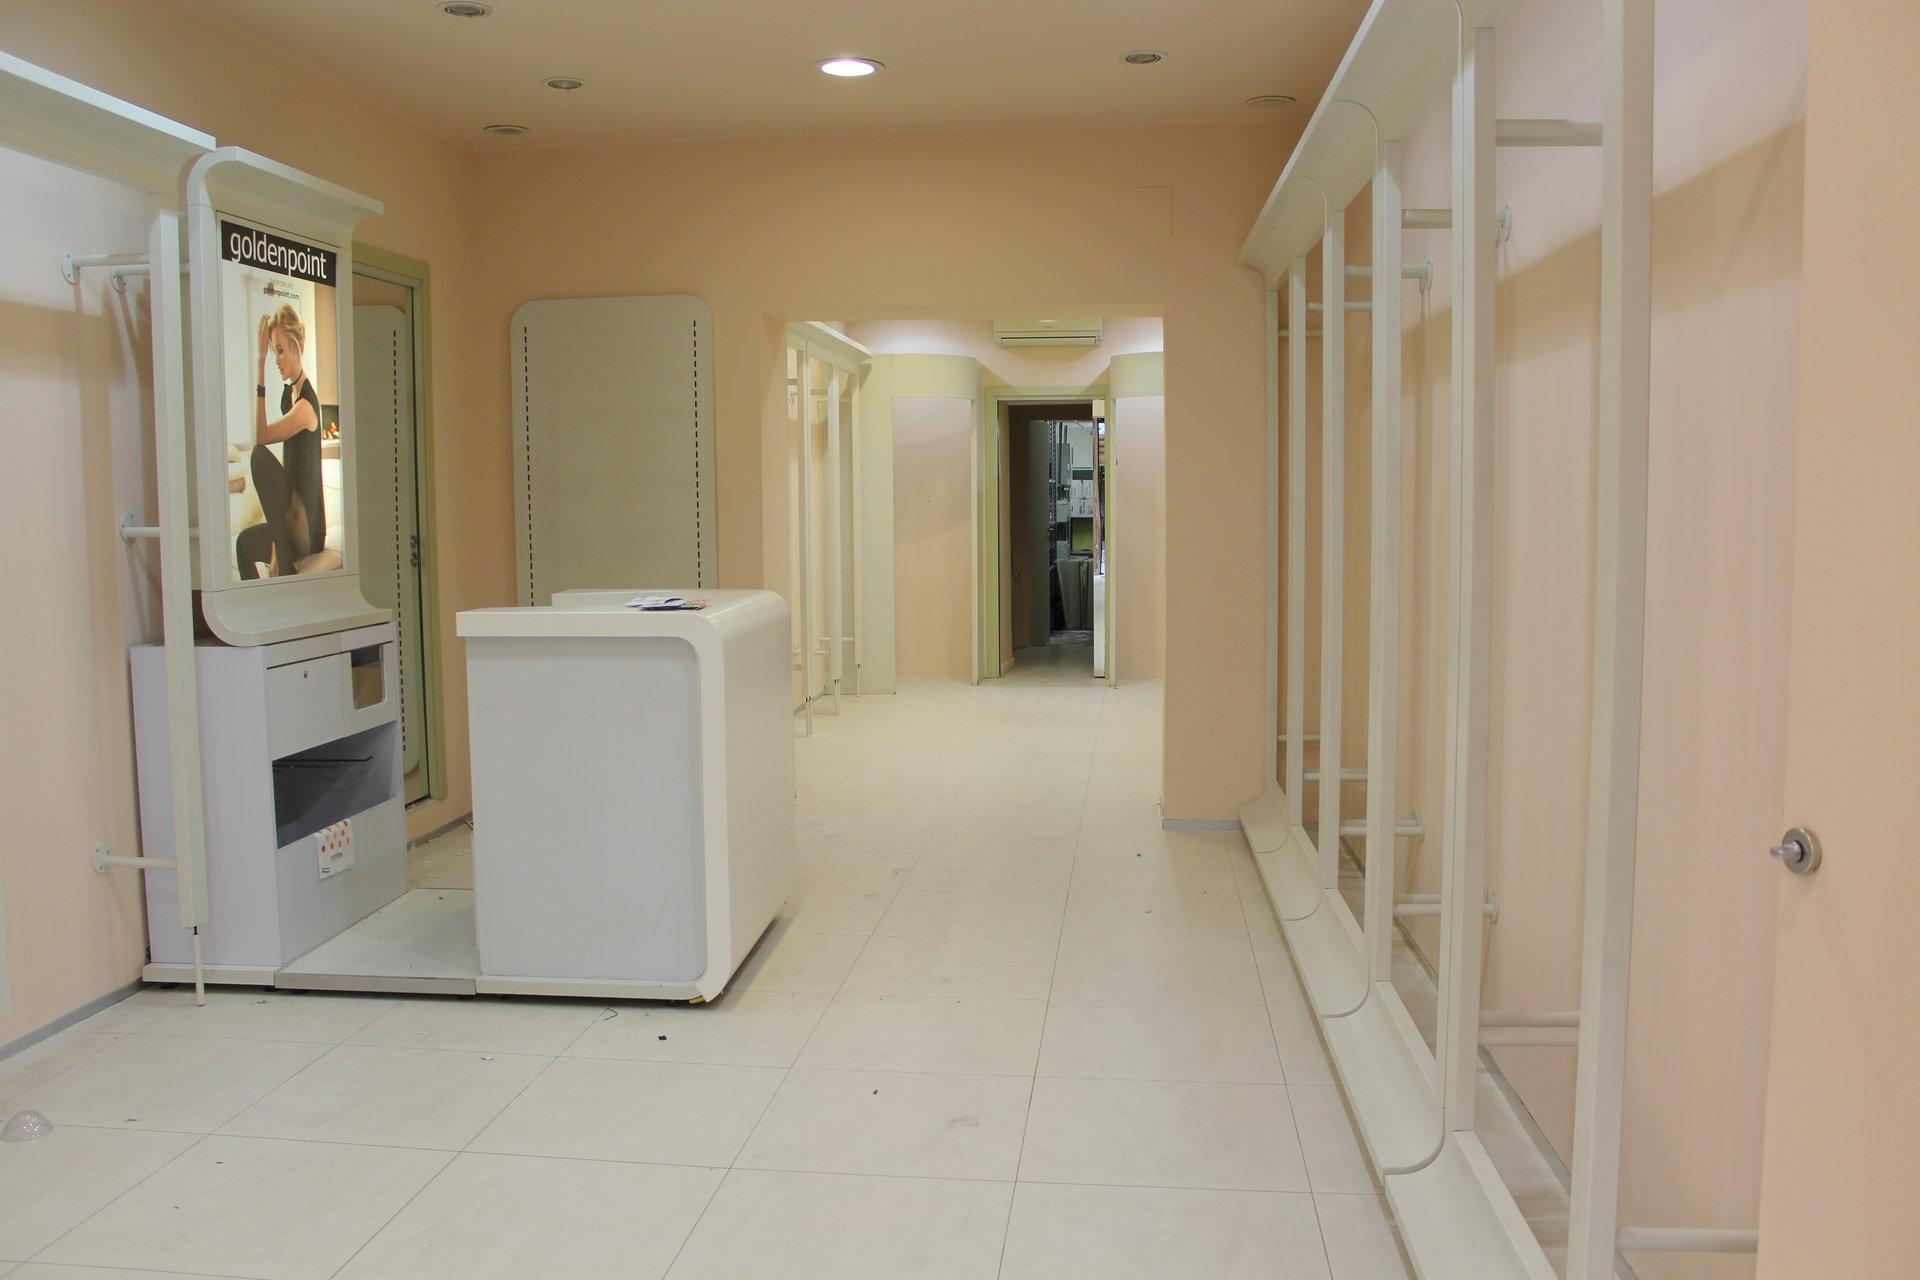 Location Commerce - Vintimille (Ventimiglia) Centro Commerciale - Italie